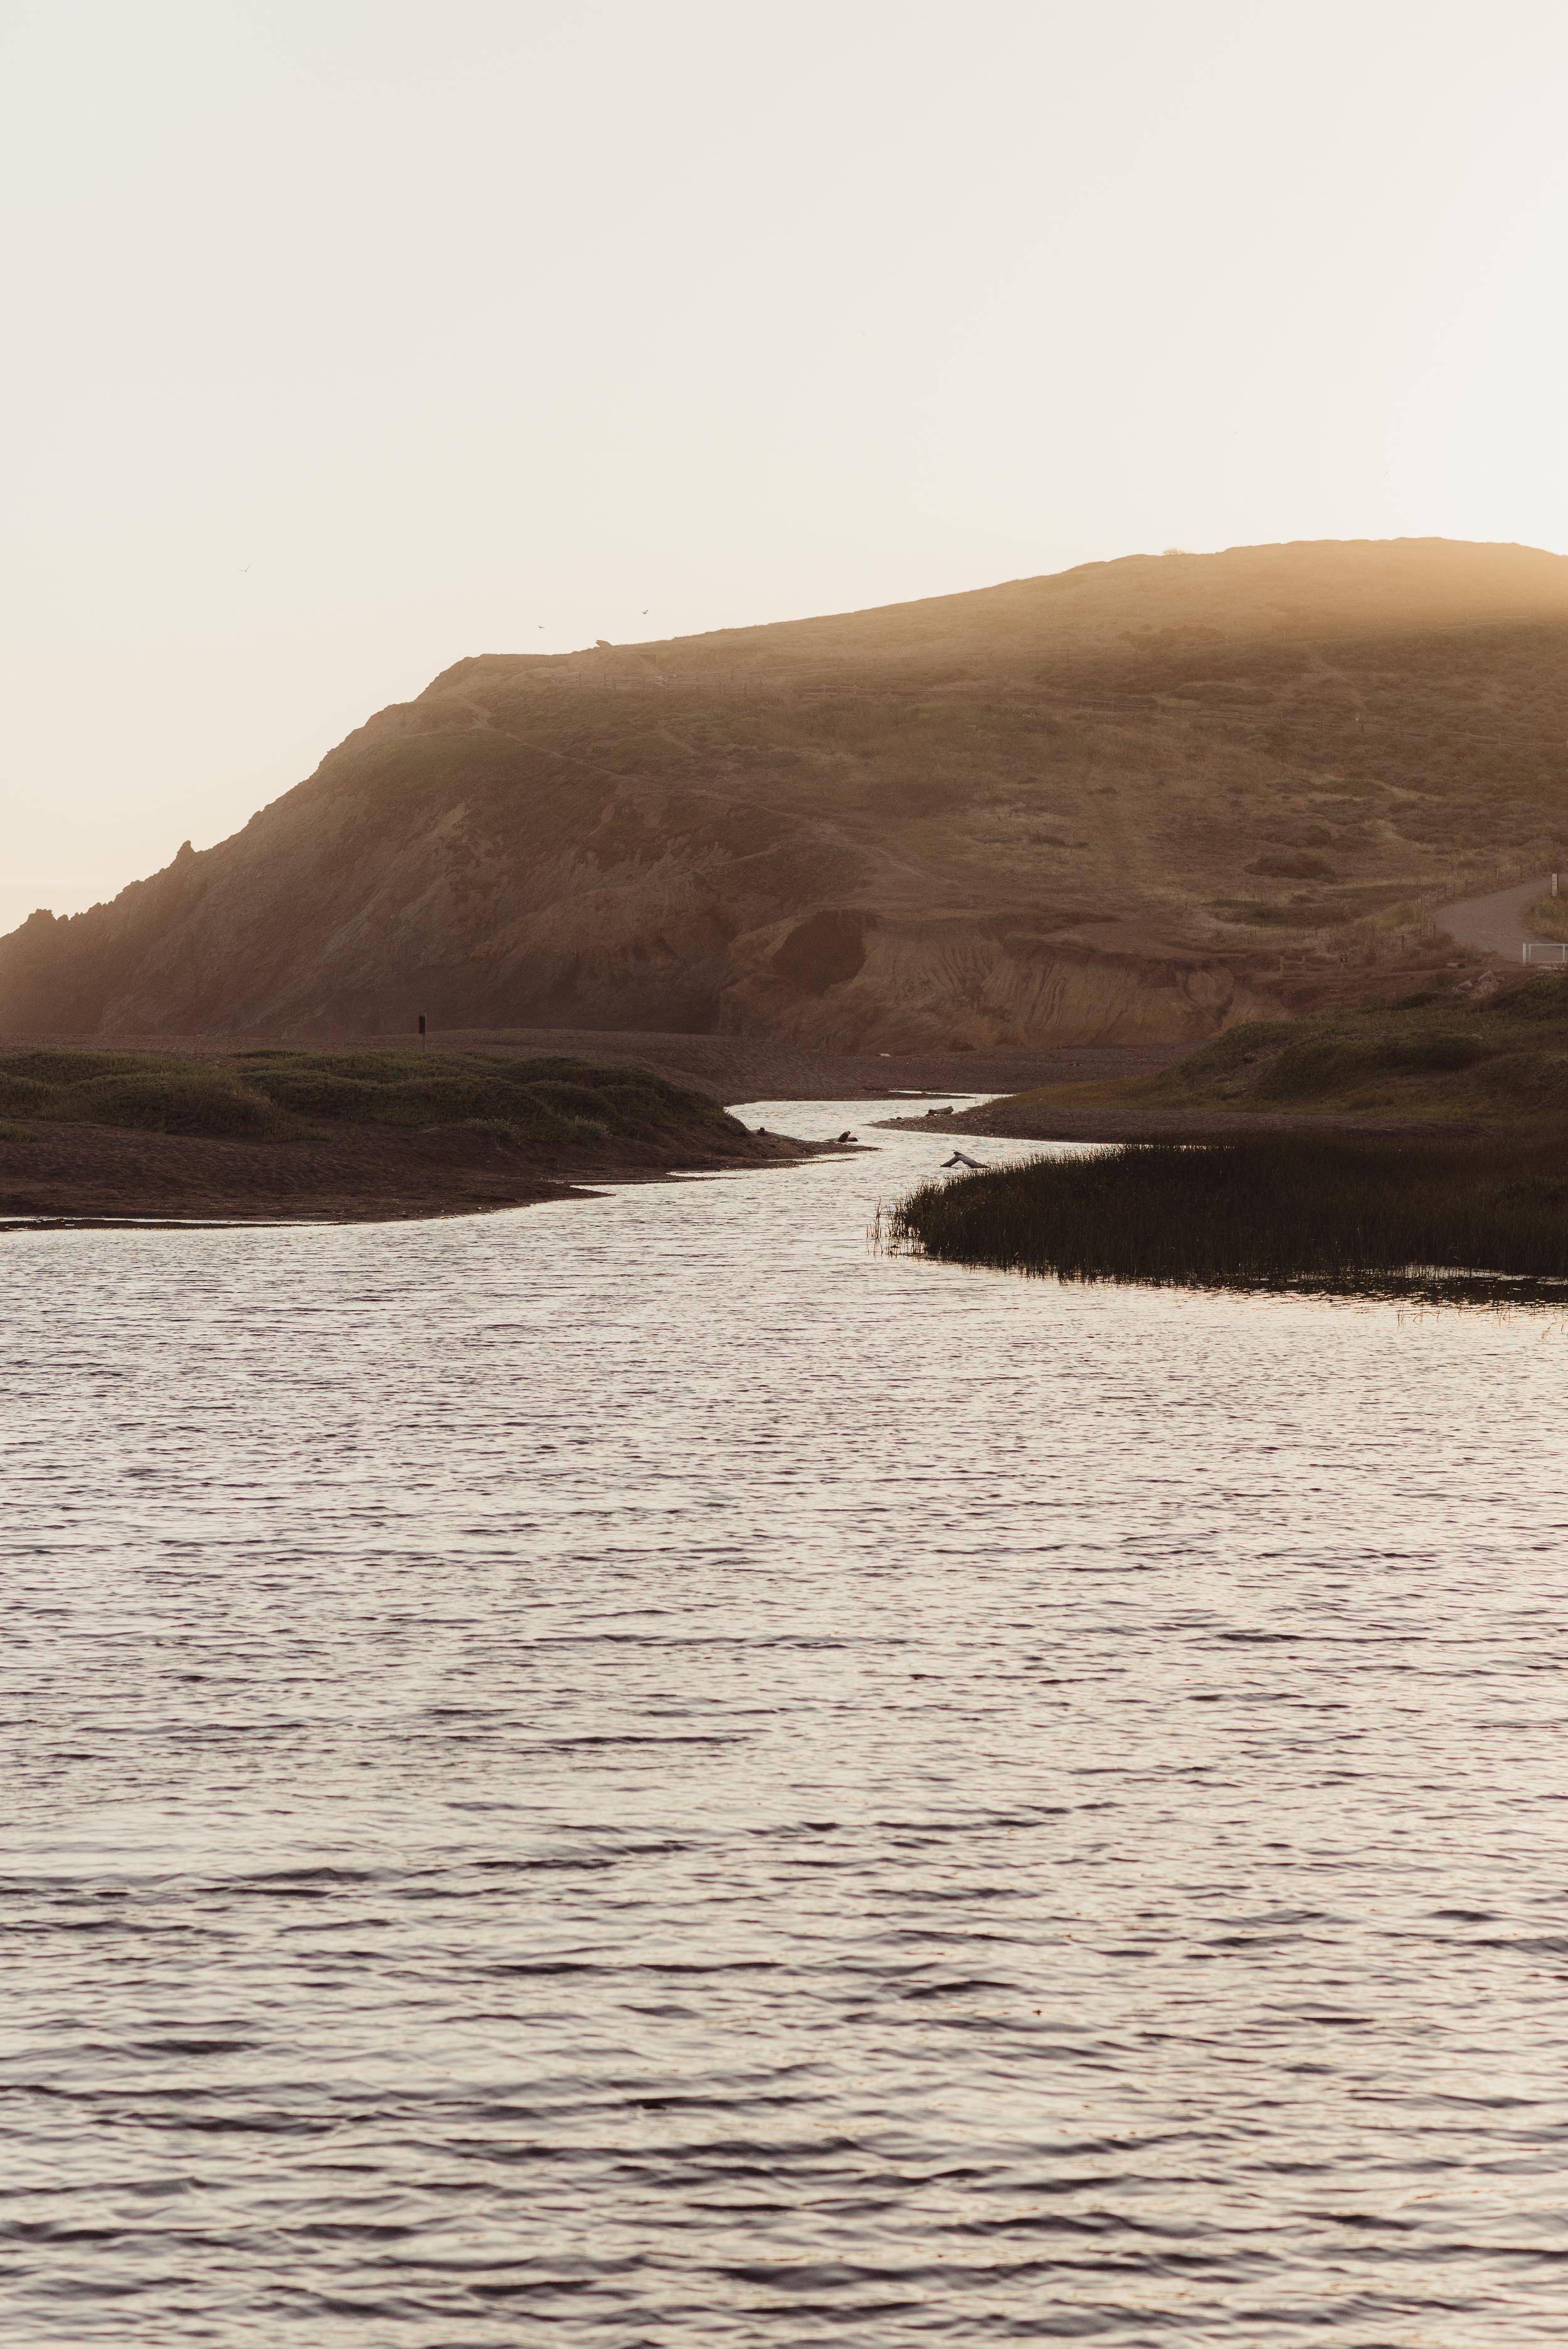 sunset-marin-headland-engagement-photographer-vivianchen-152.jpg